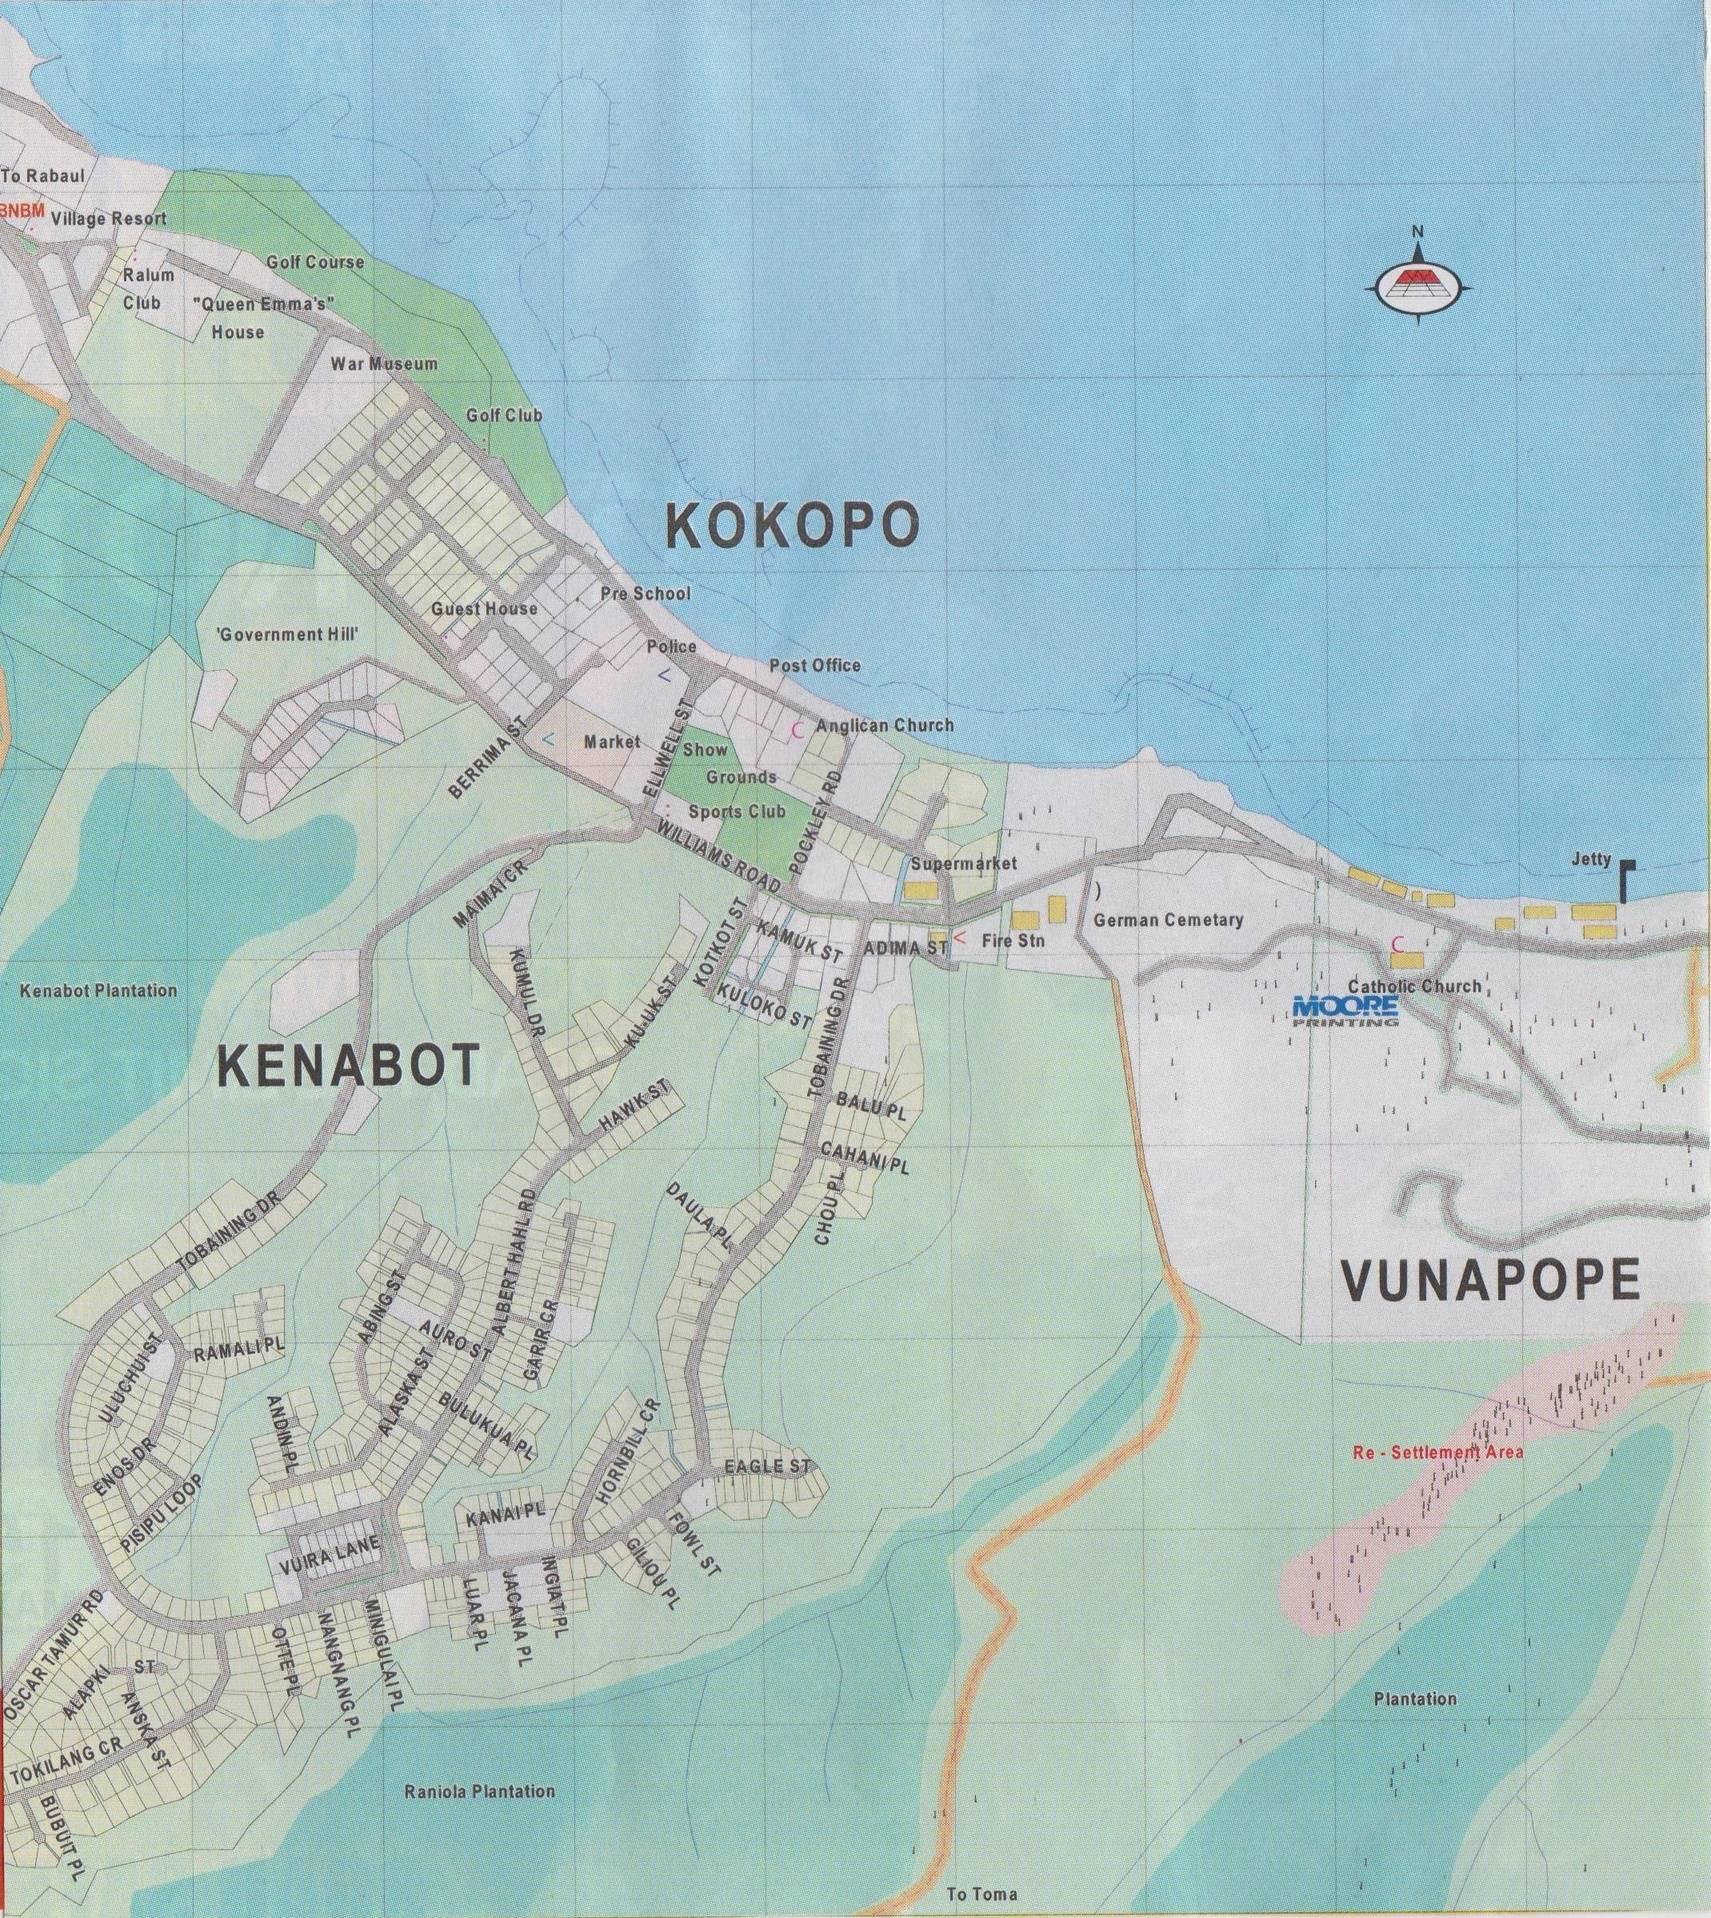 Kokopo, East New Britain Province, Portion 601, Kokopo, East New Britain, 611, Papua New Guinea